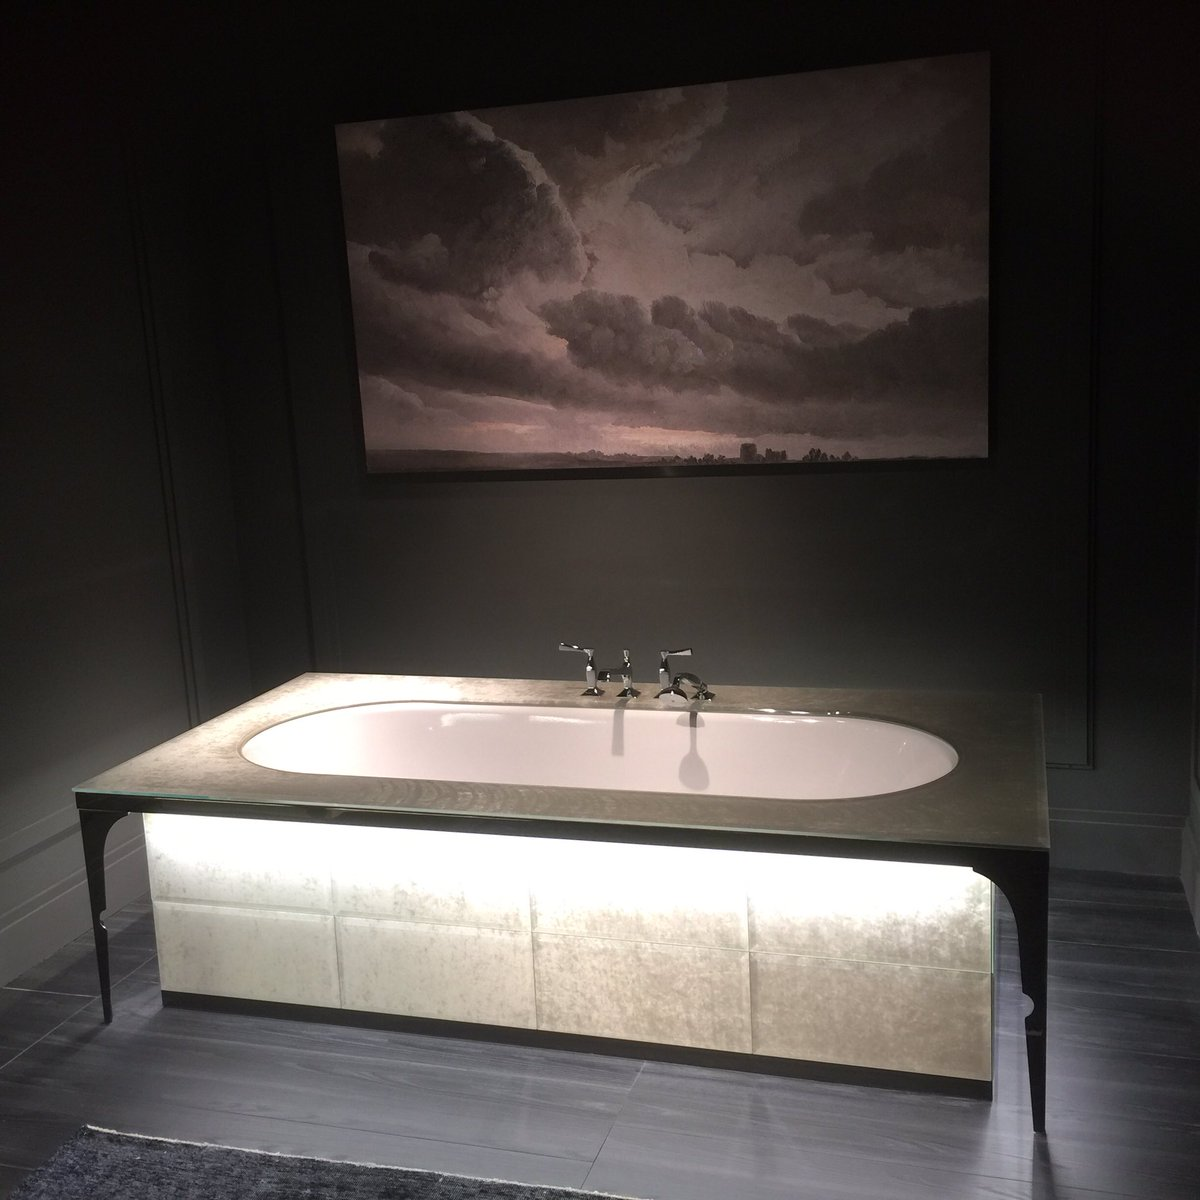 Salle De Bain Oleksiak ~ vatero bath kitchen vatero_bk twitter